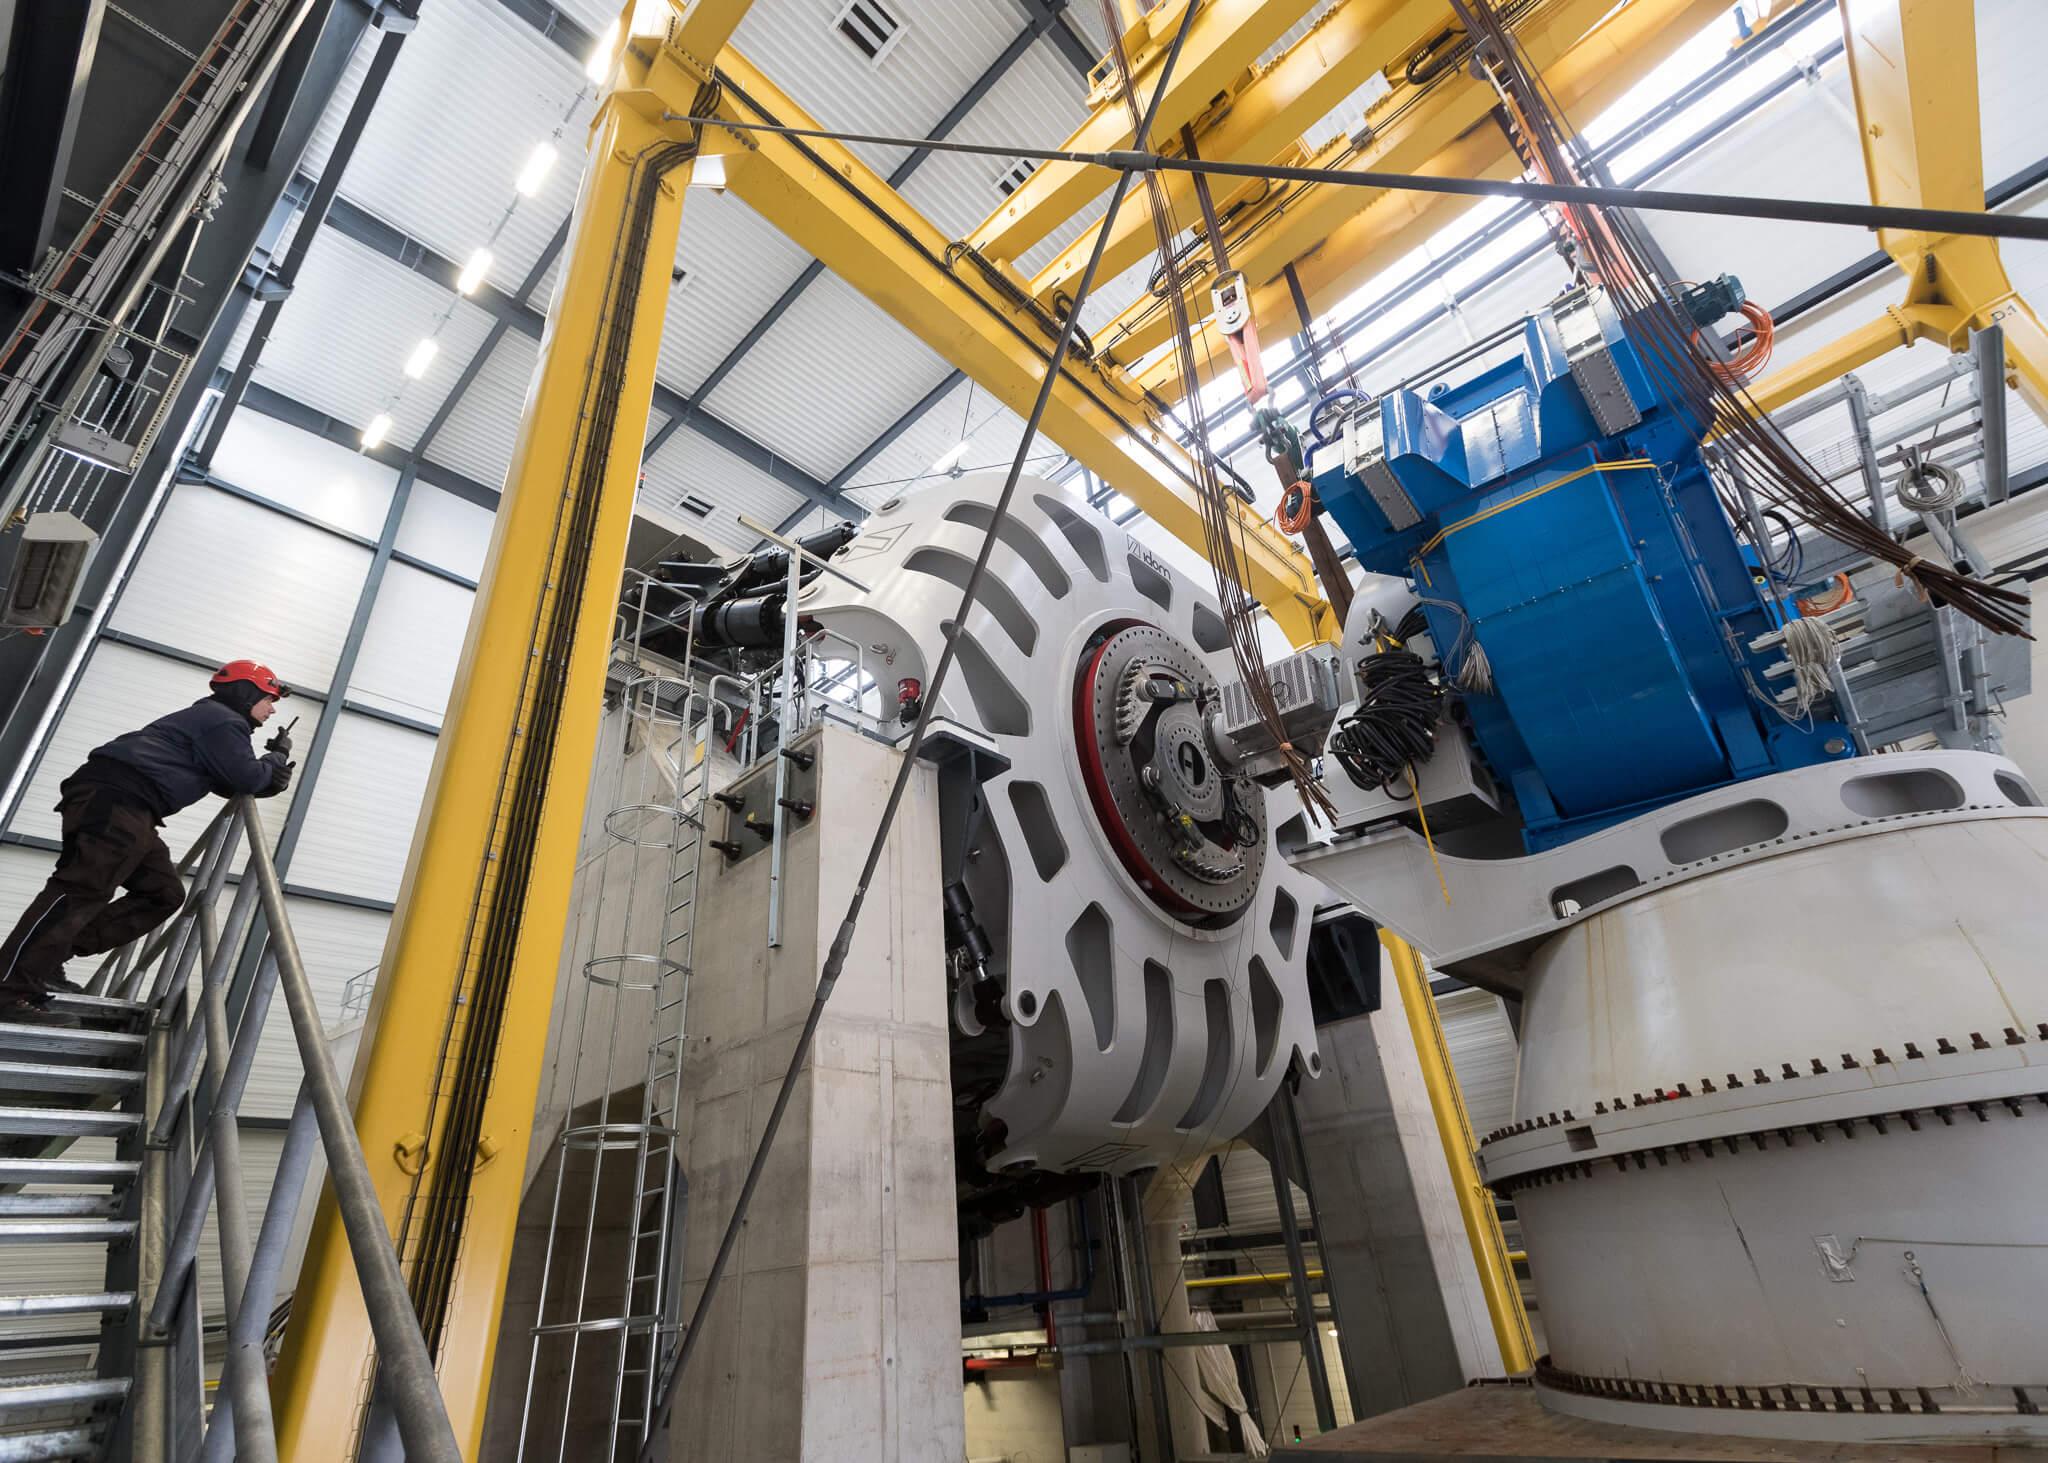 Testy supravodivého generátoru vlaboratoři. Kredit: Fraunhofer IWES, Jan Meier.